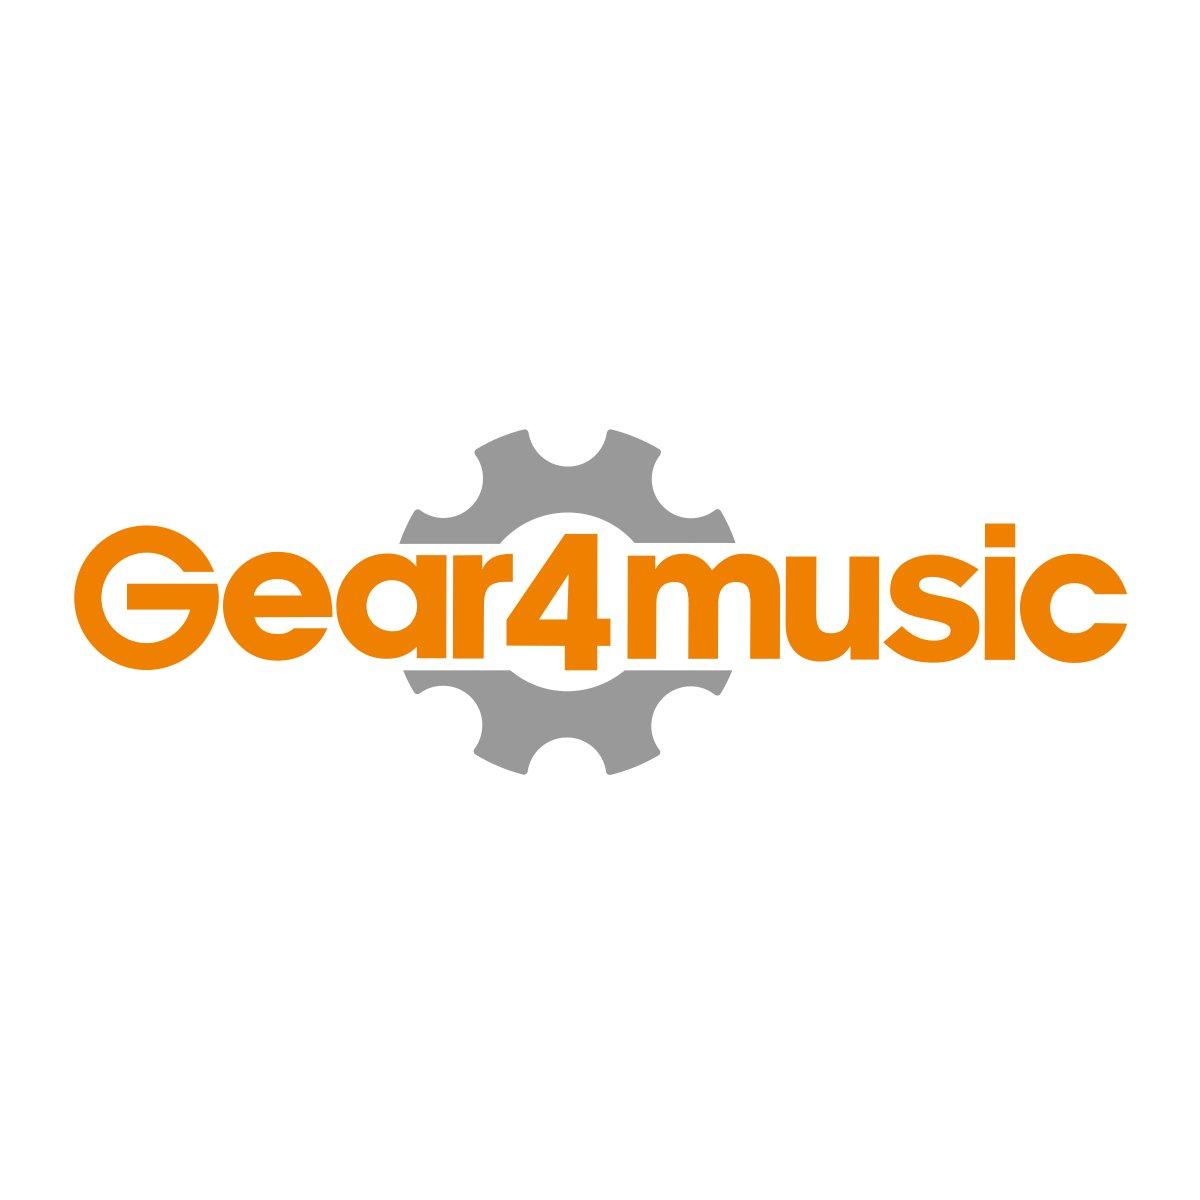 Flauto a Testata Curva per Studenti Gear4music